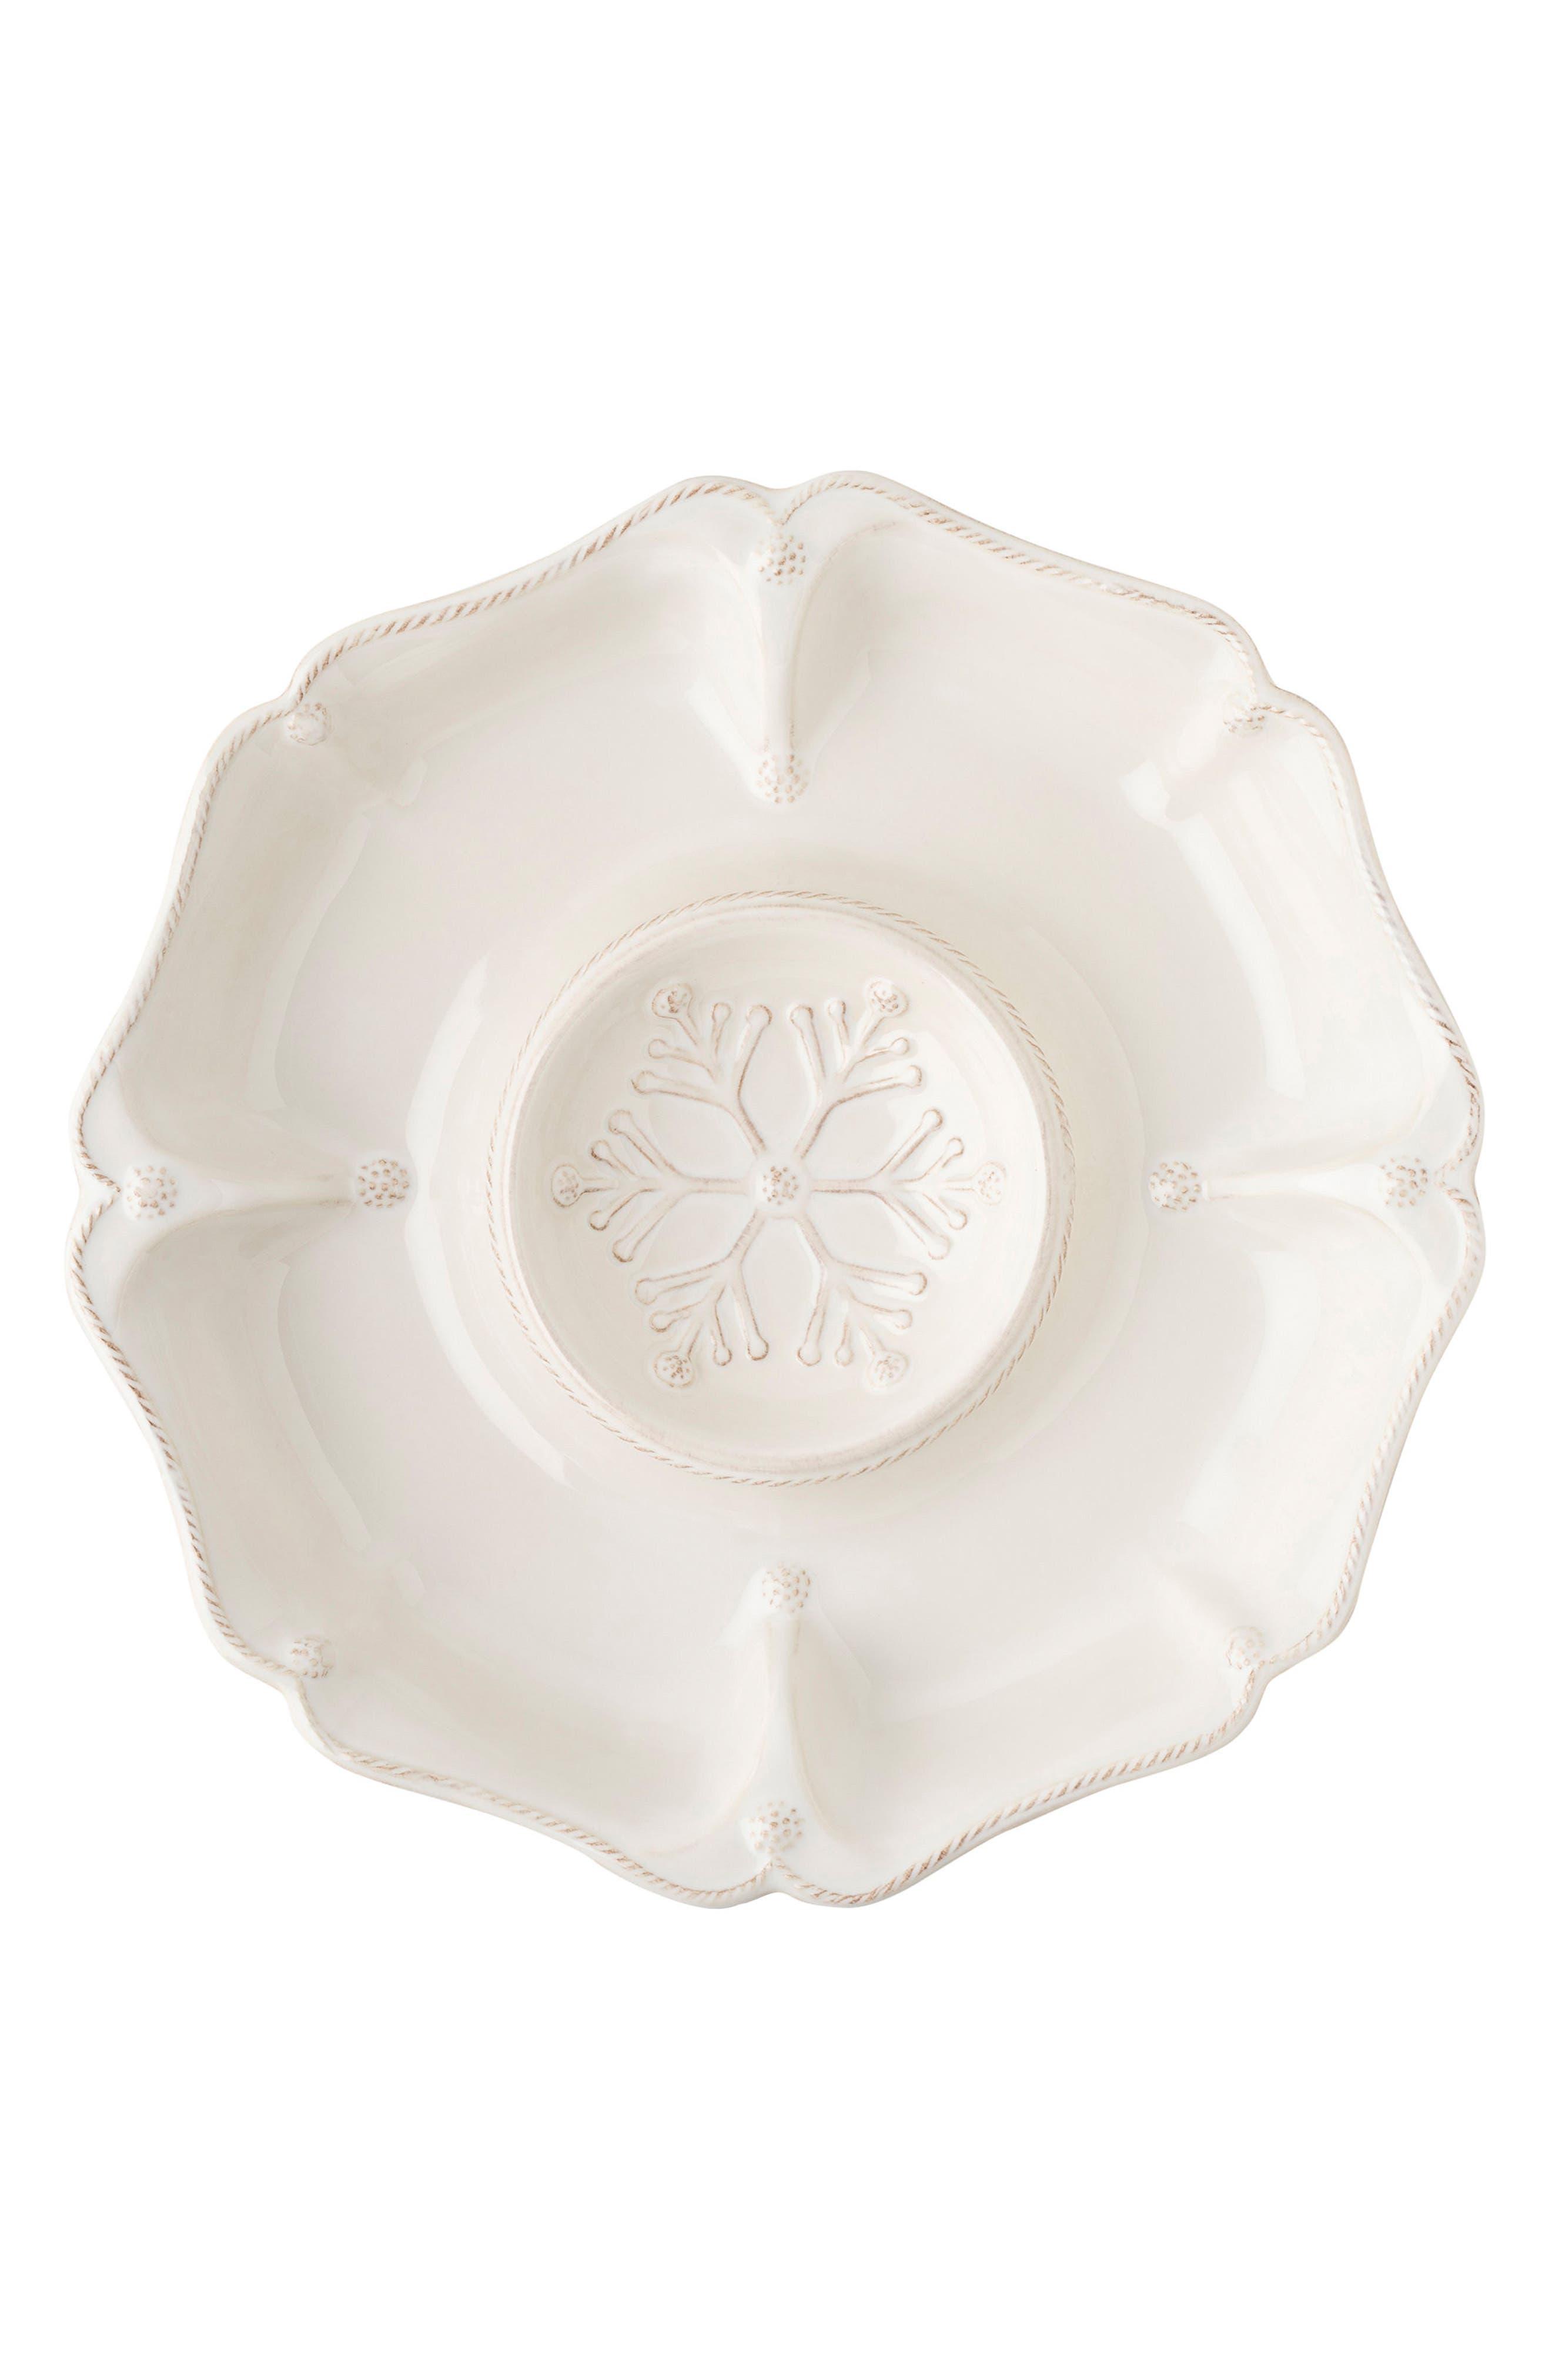 Main Image - Juliska Berry & Thread Ceramic Hors D'Oeuvres Serving Tray